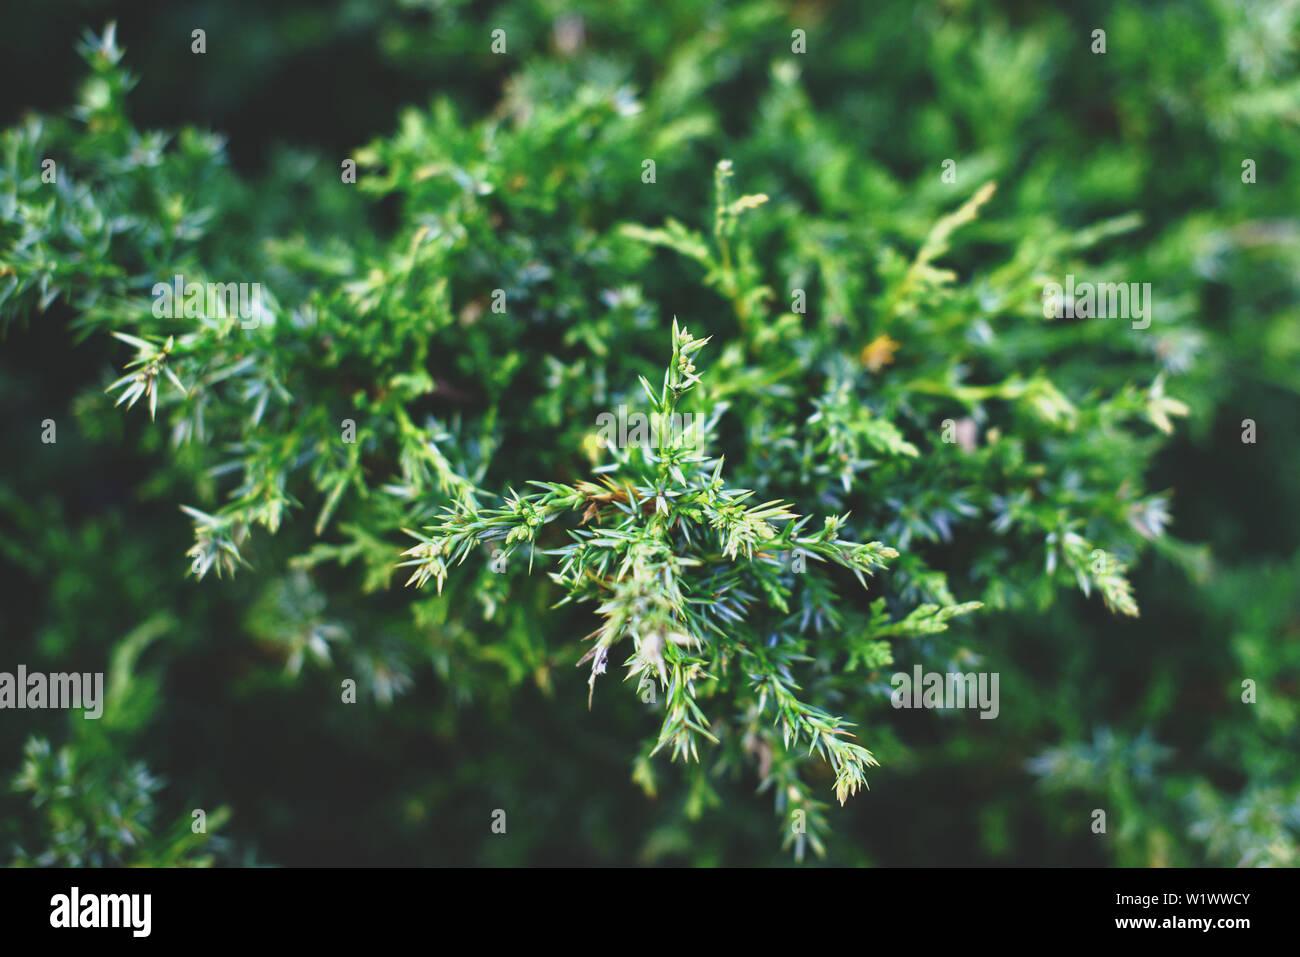 Thuja tree branches, thuja evergreen coniferous tree. Stock Photo